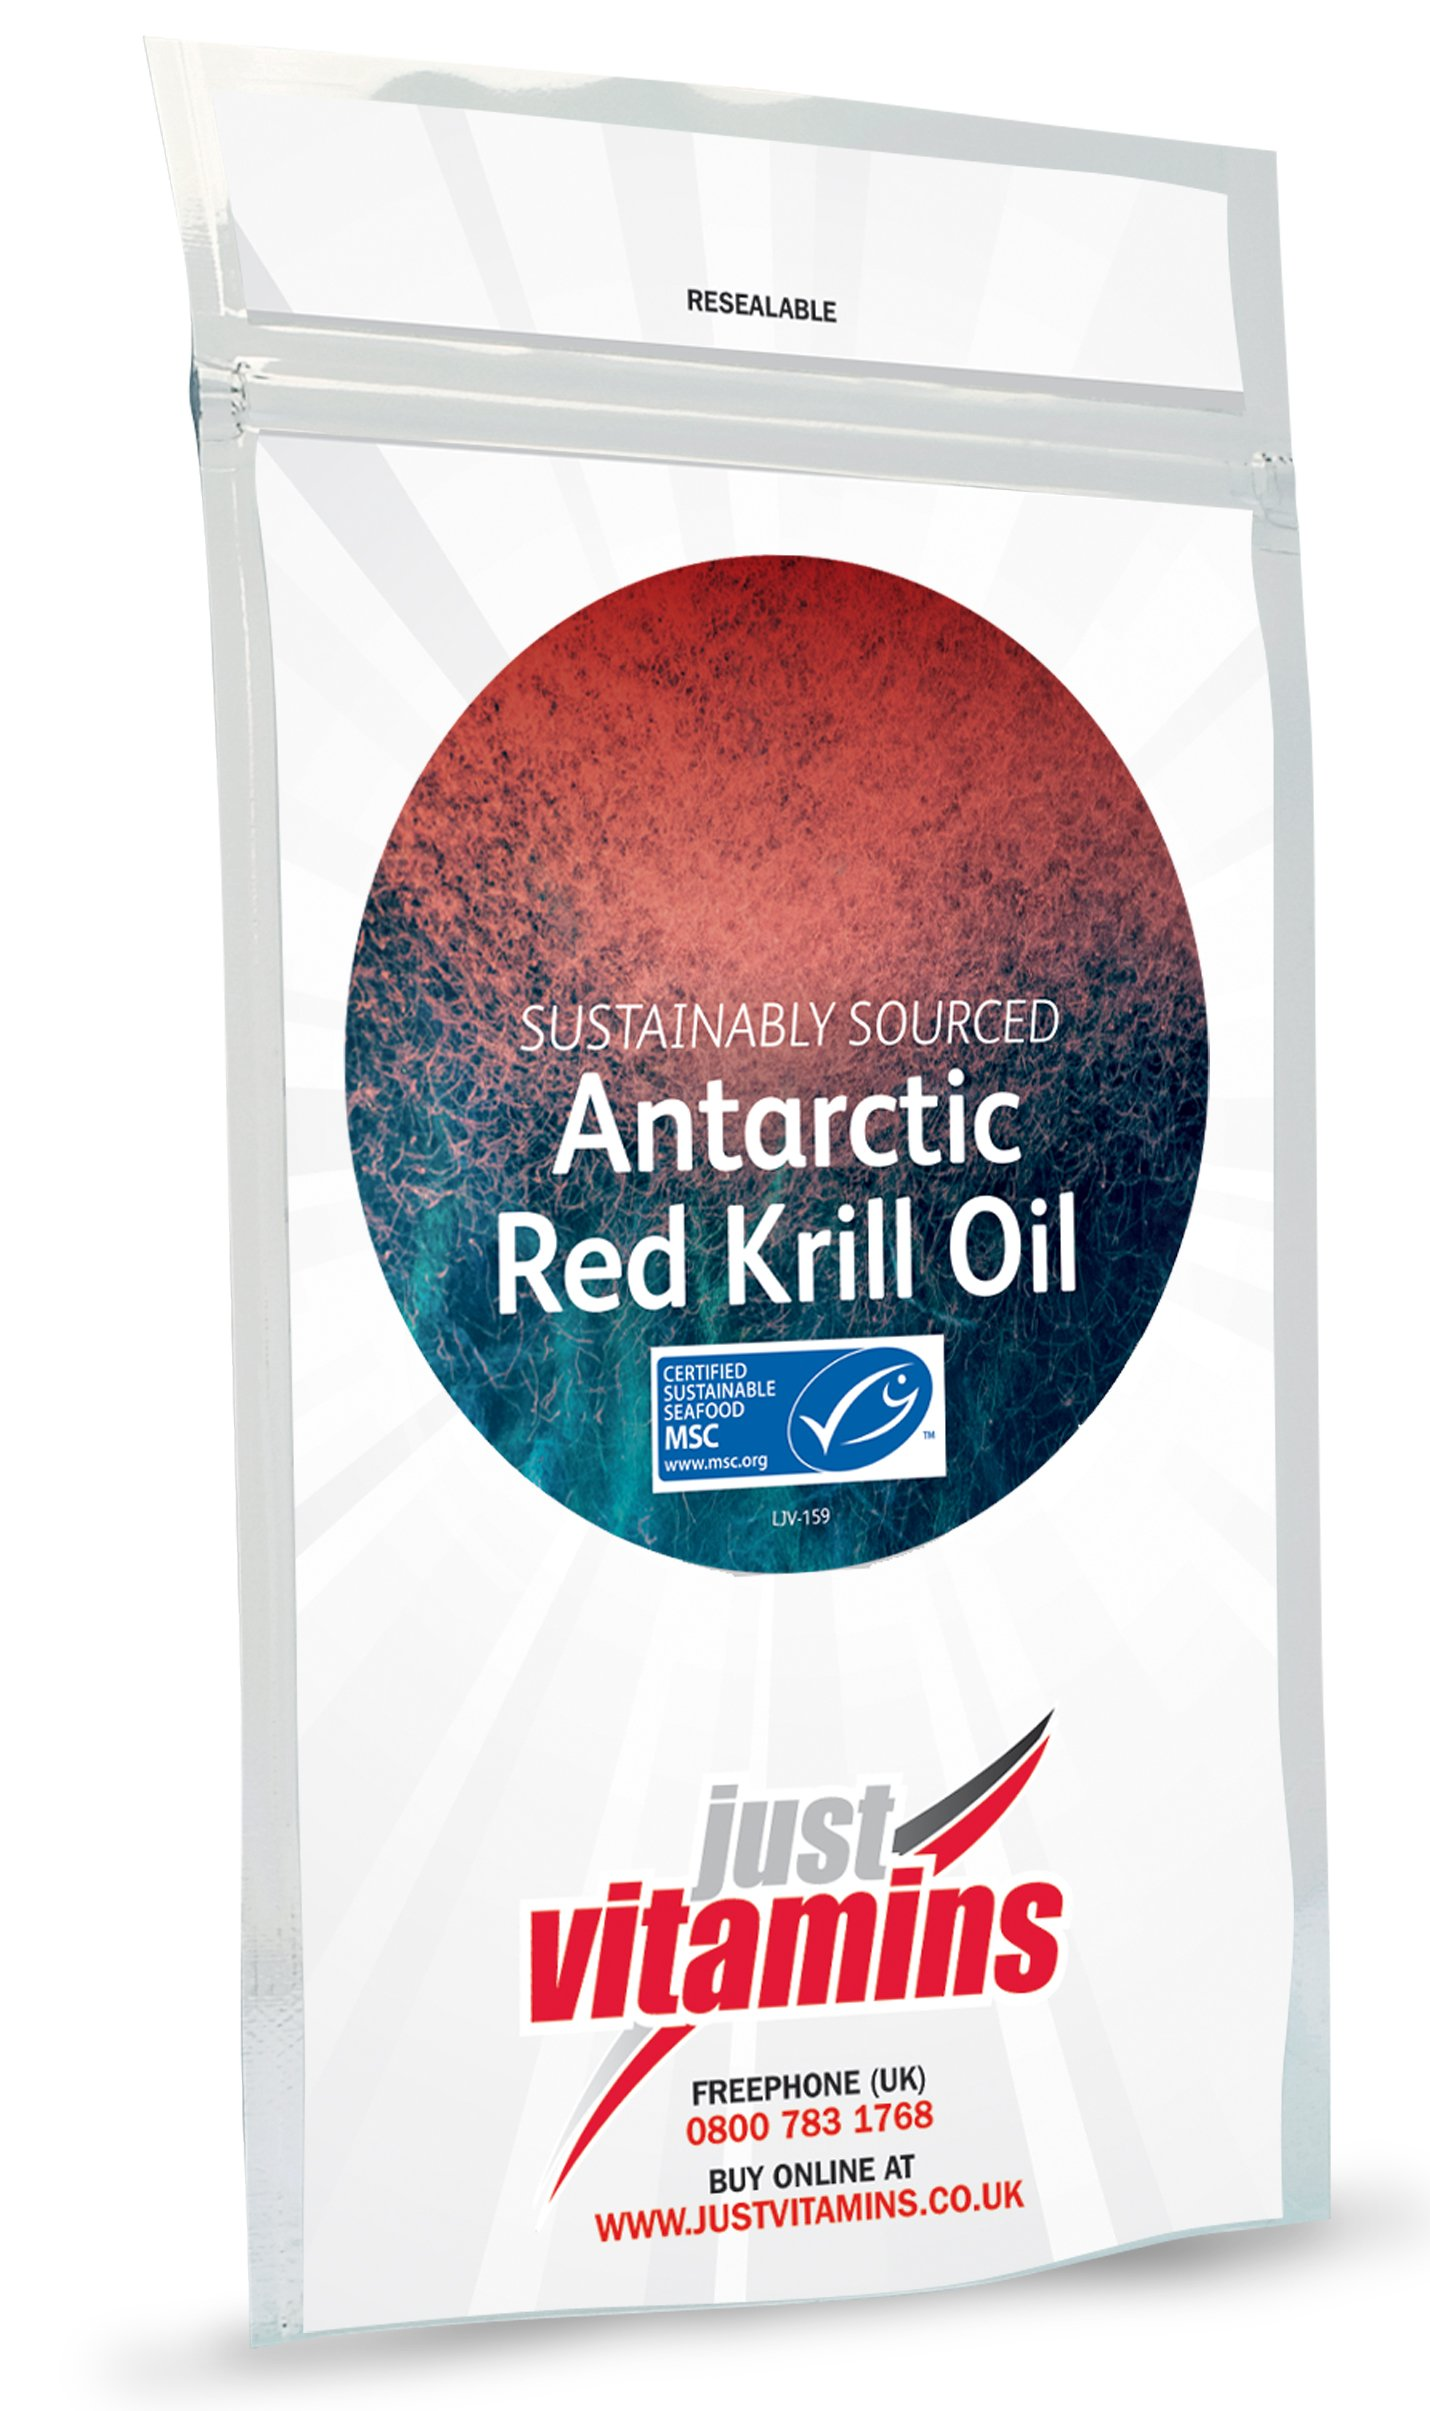 Just Vitamins Krill Oil 500mg 120 capsules by Just Vitamins